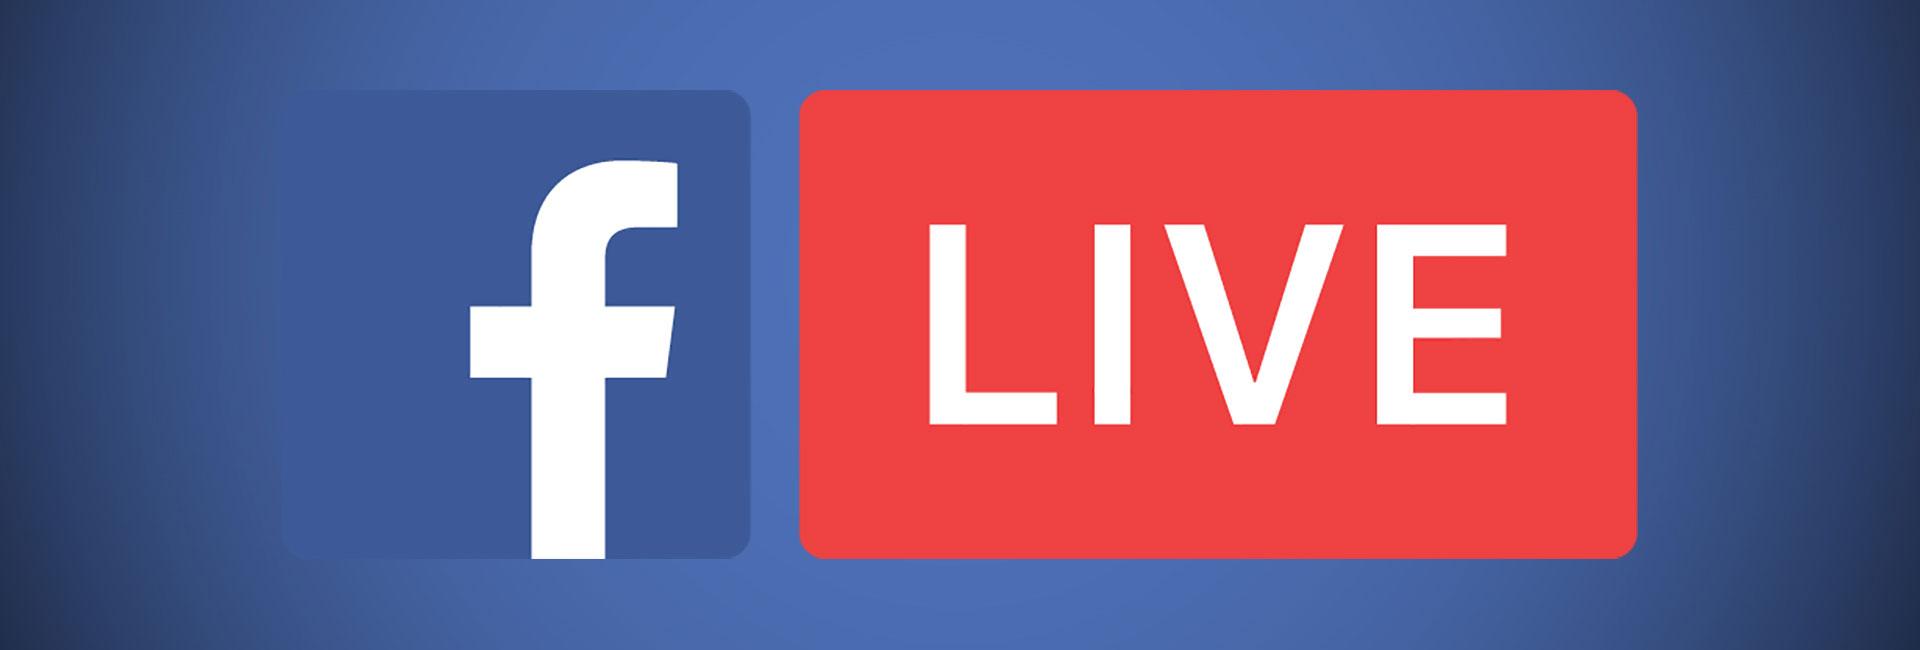 facebook webcasting company